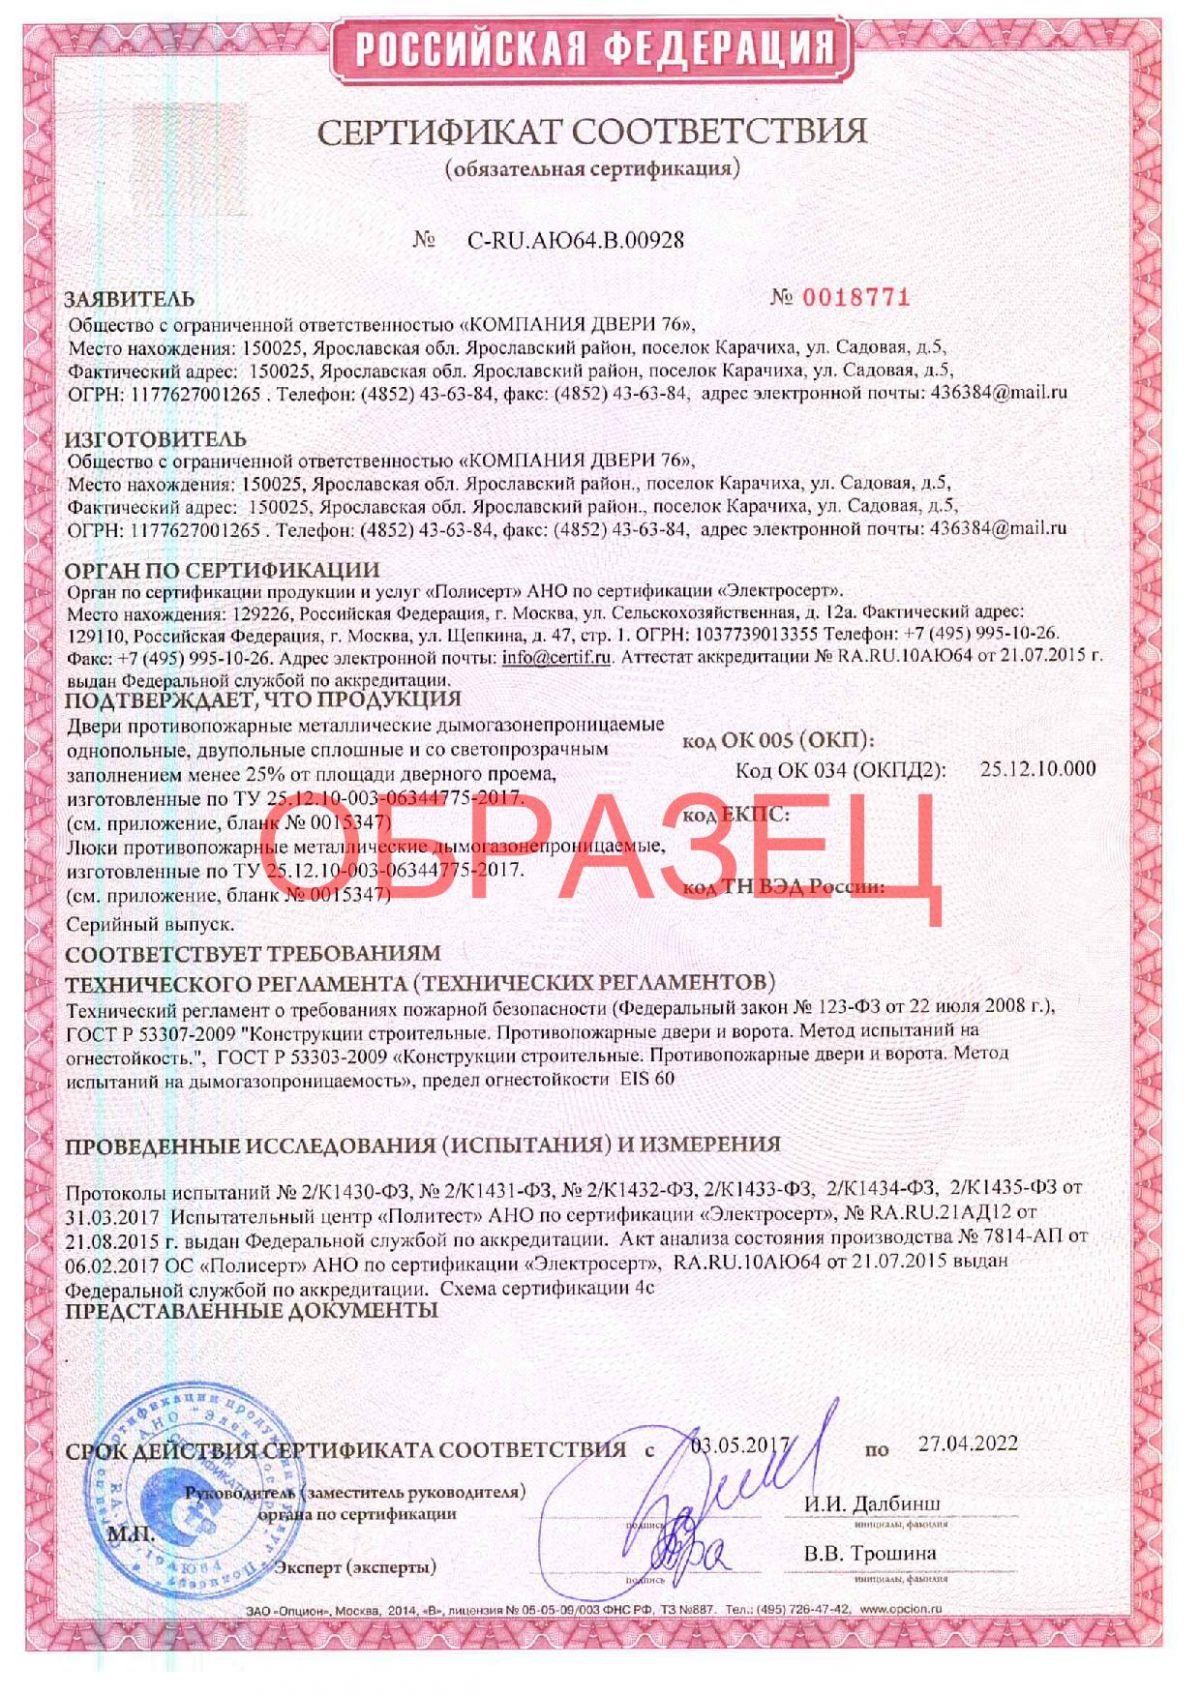 Сертификация д отраслевая сертификация смкна базе международных стандартов